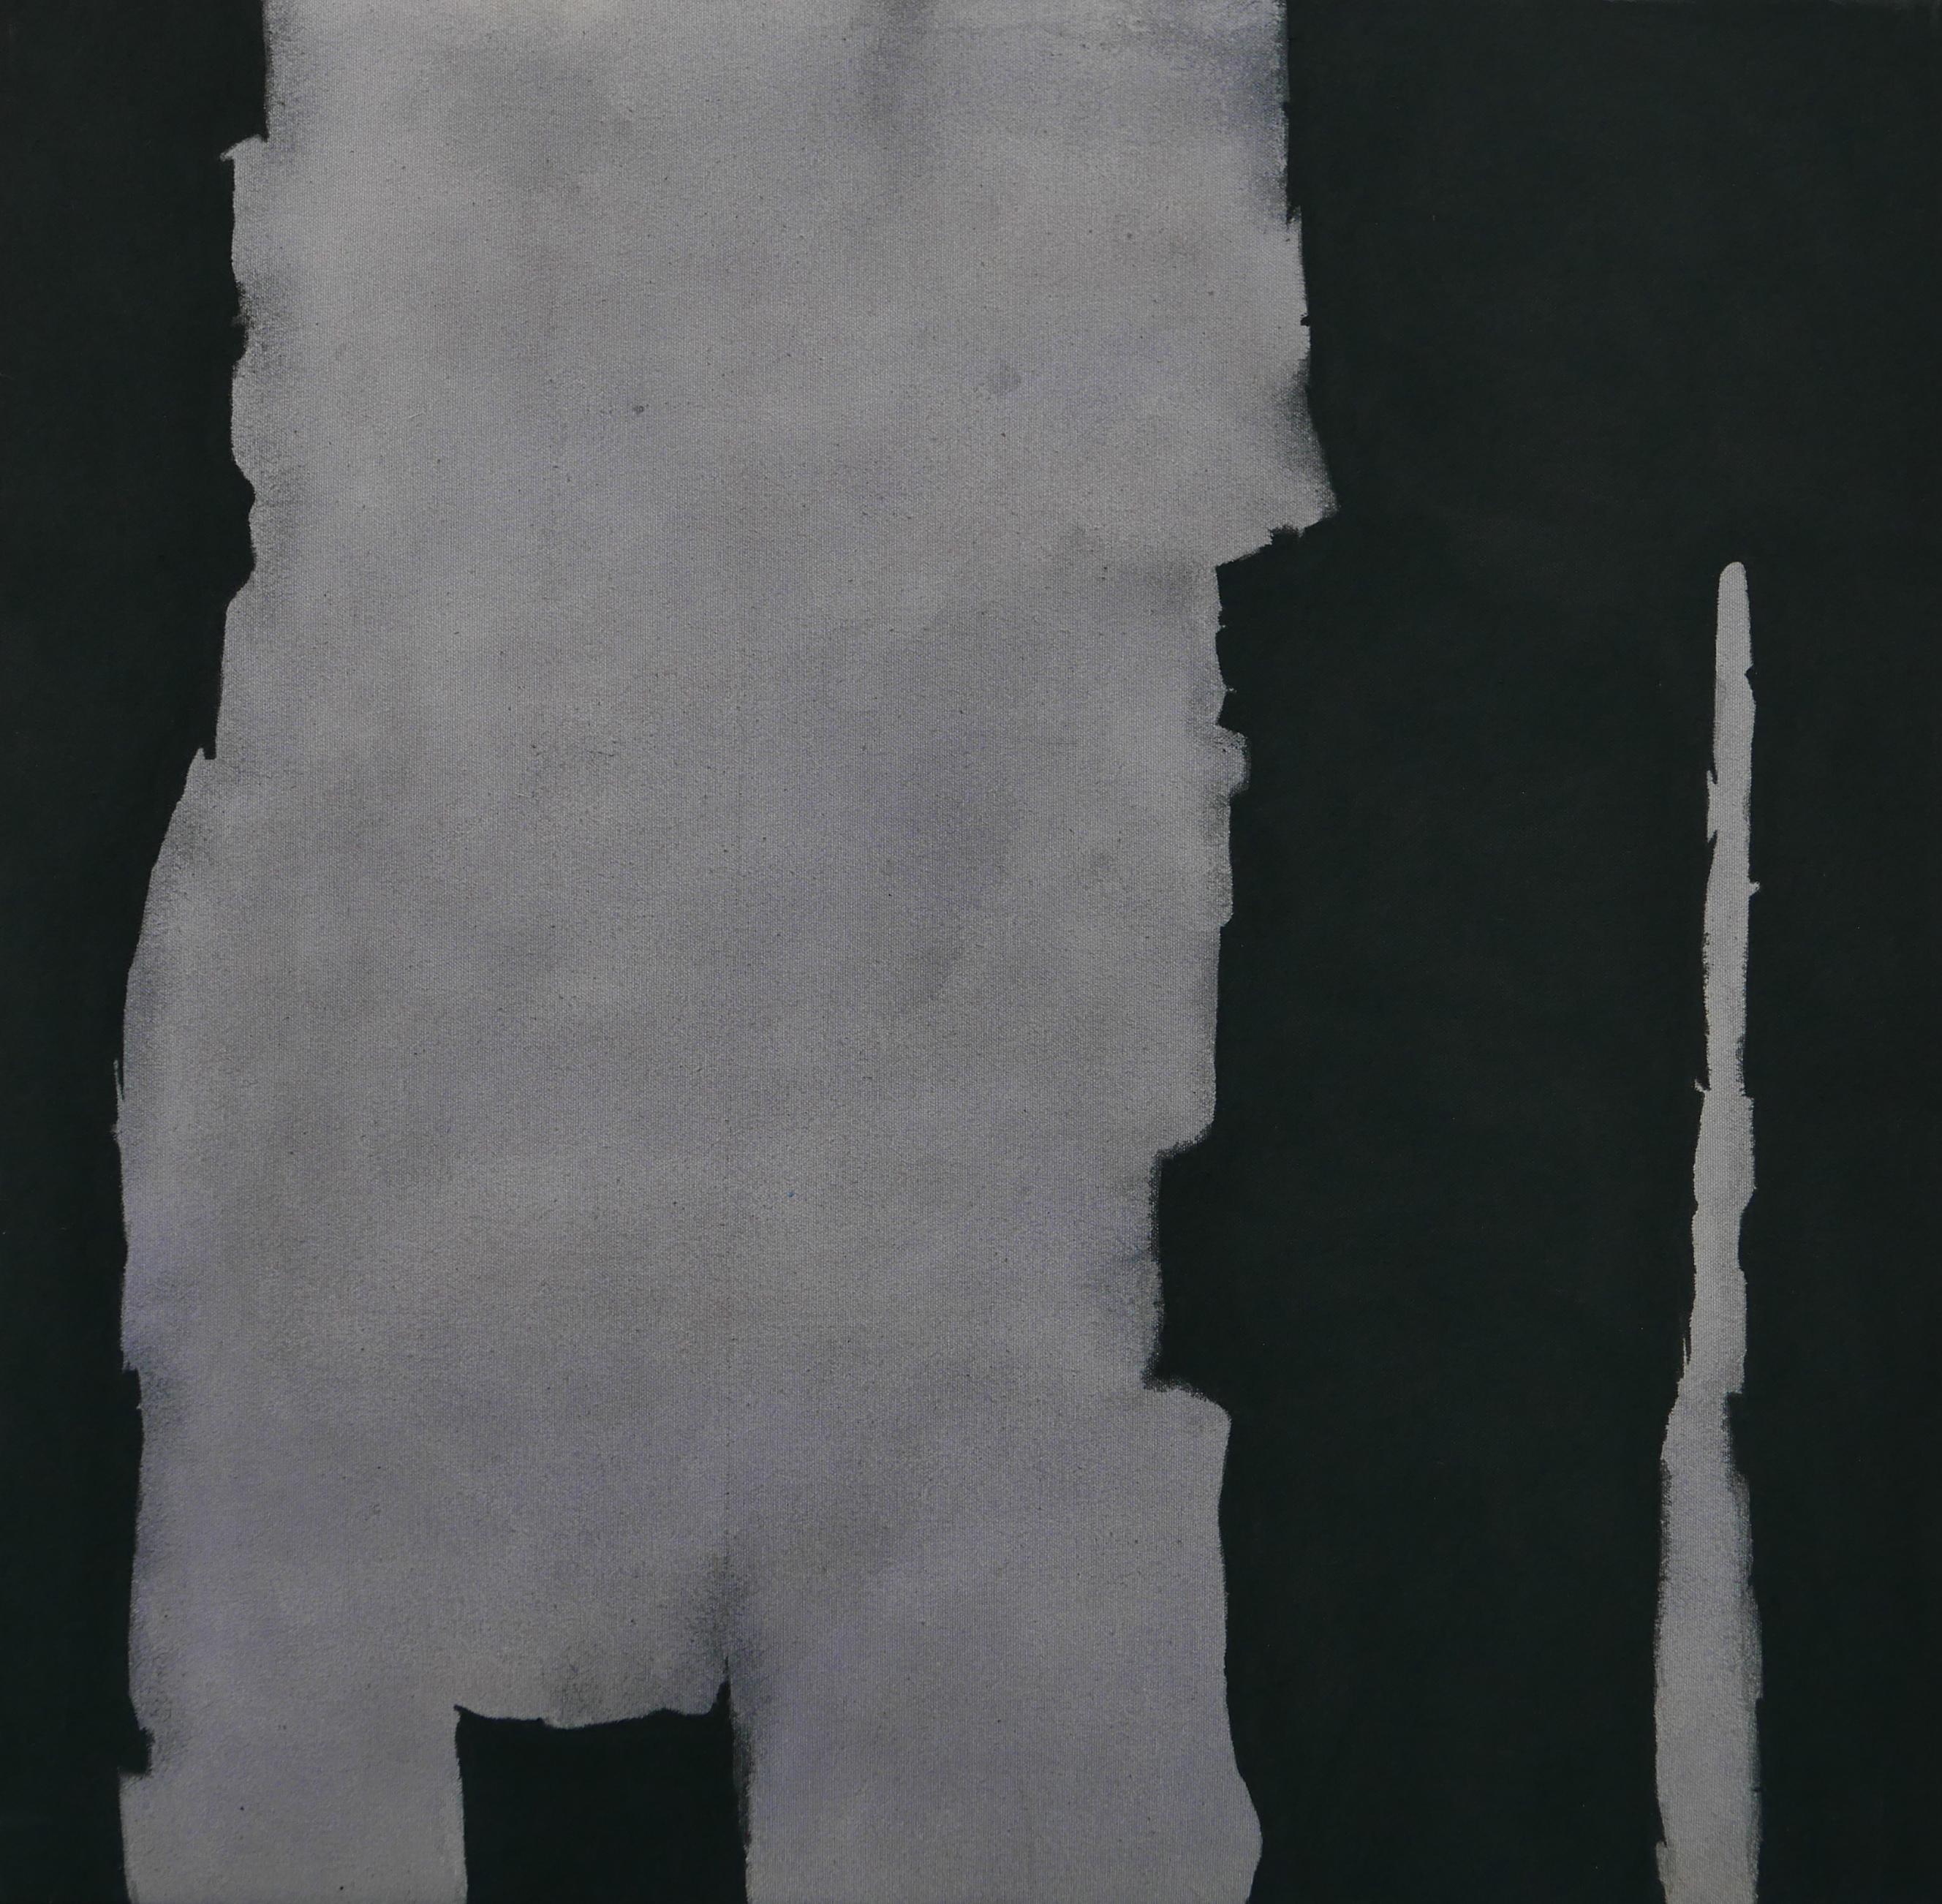 Rock, slate and scree (black_grey #1)